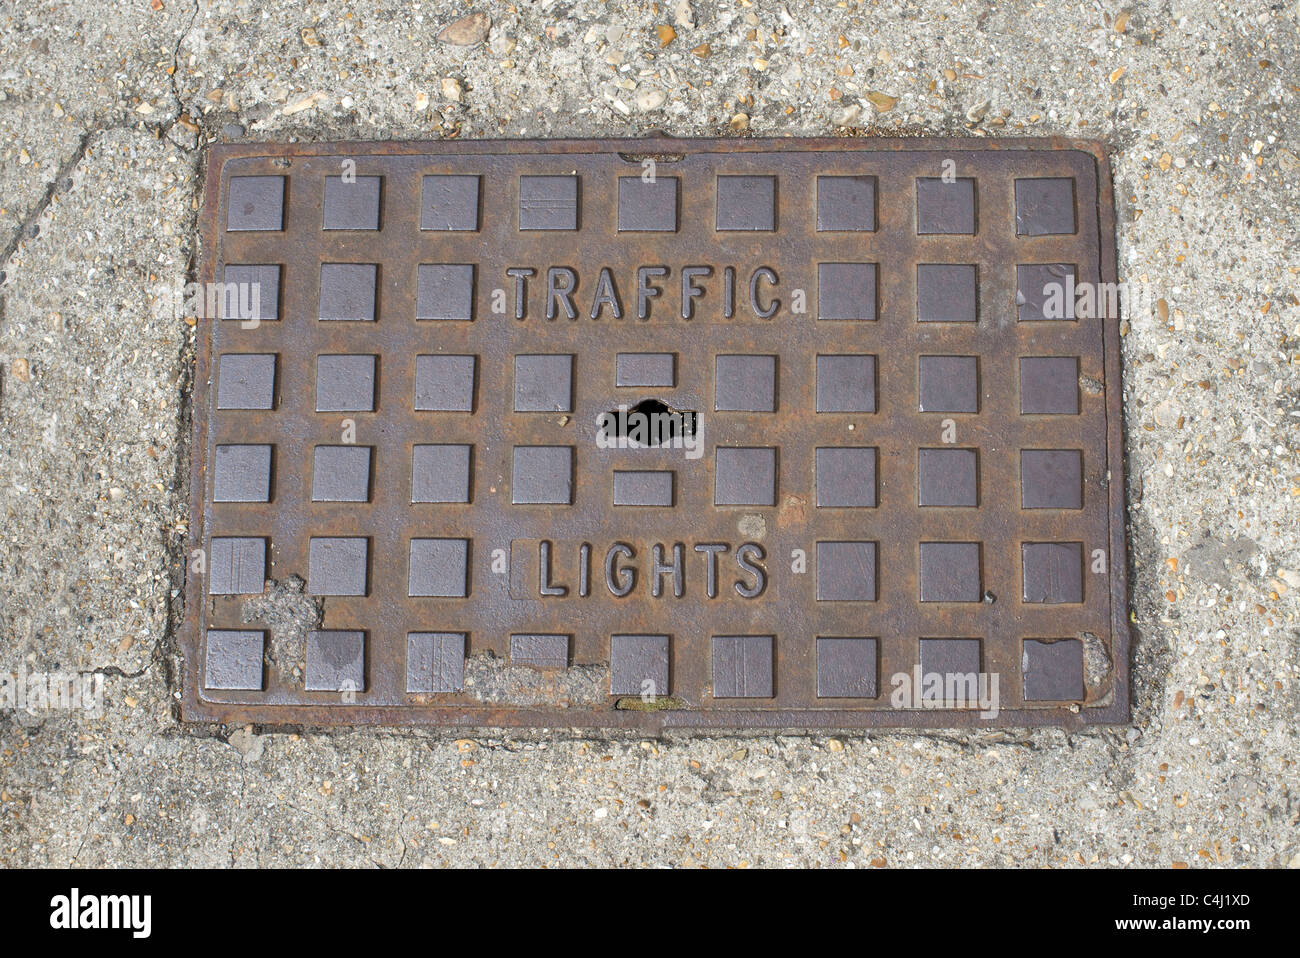 traffic lights manhole cover - Stock Image